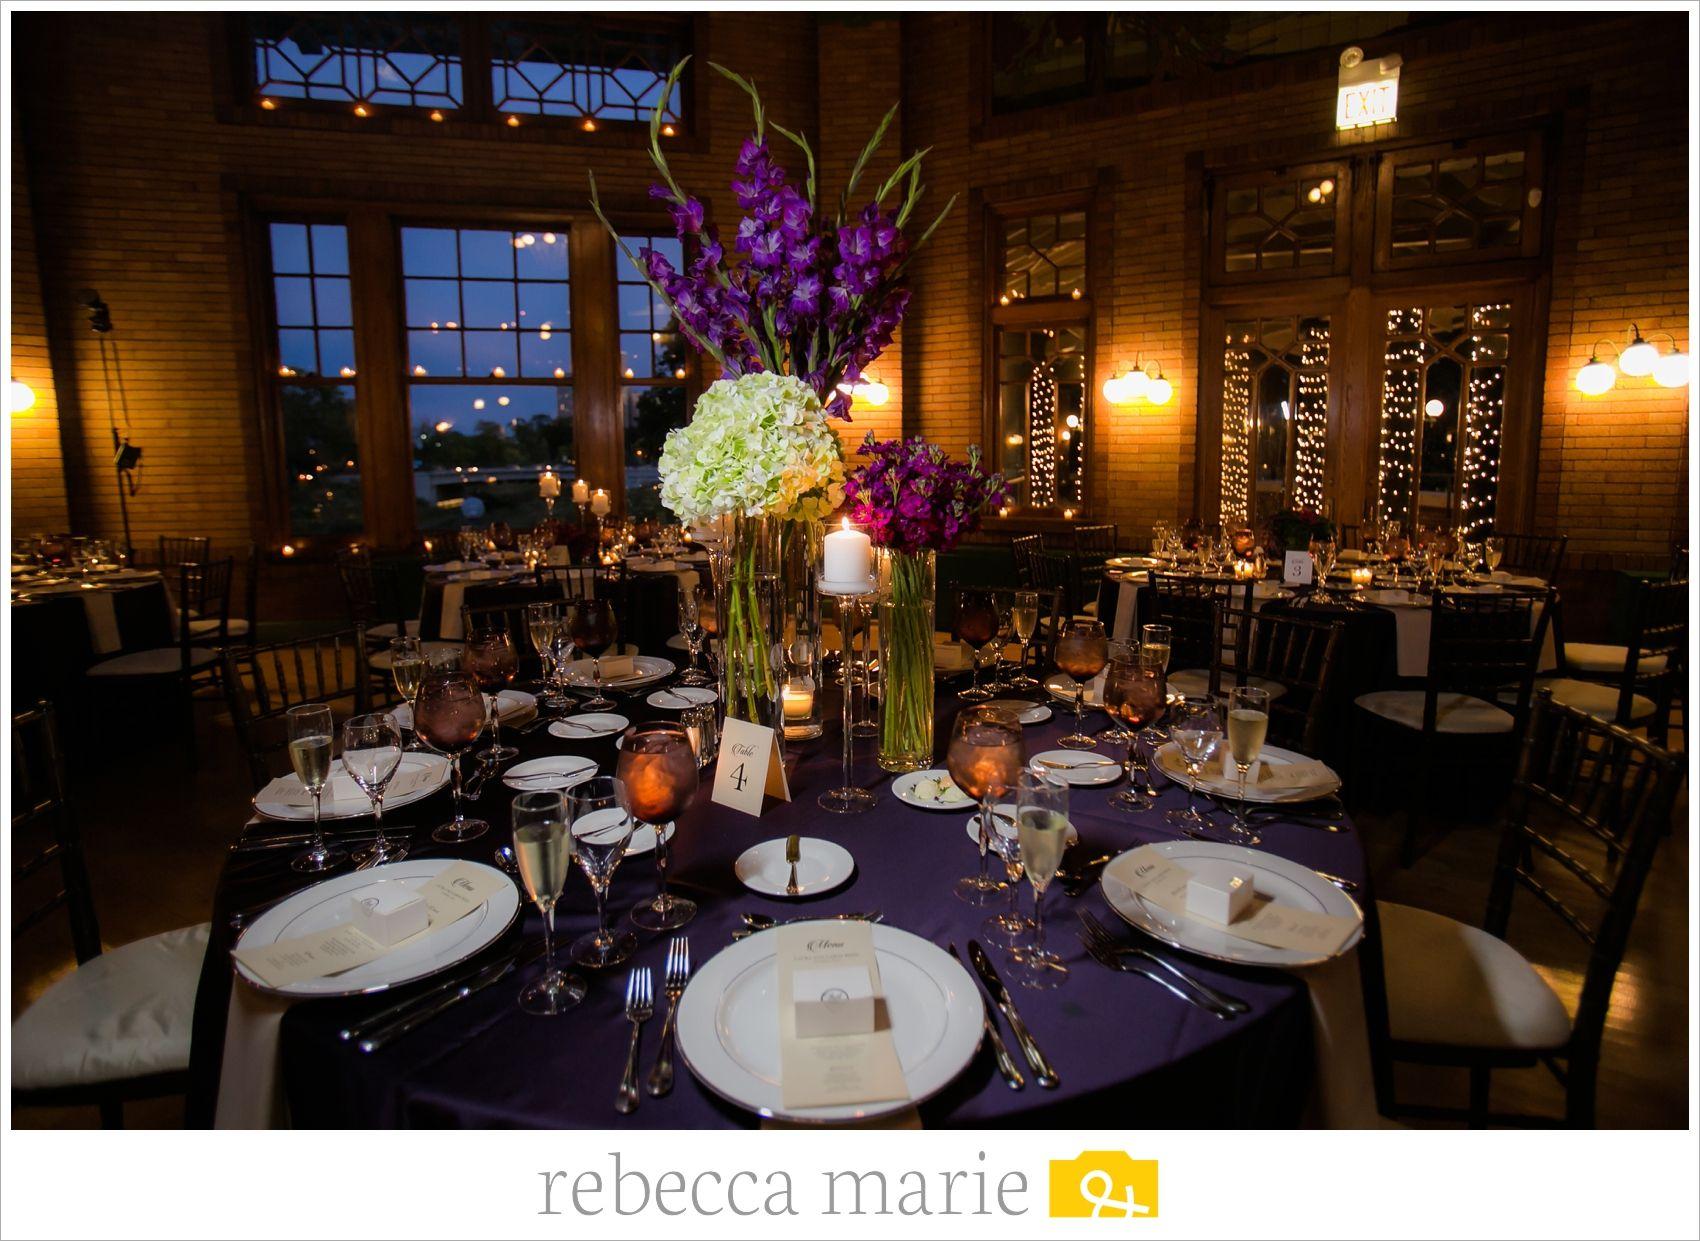 This elegant Cafe Brauer Chicago wedding featured purple